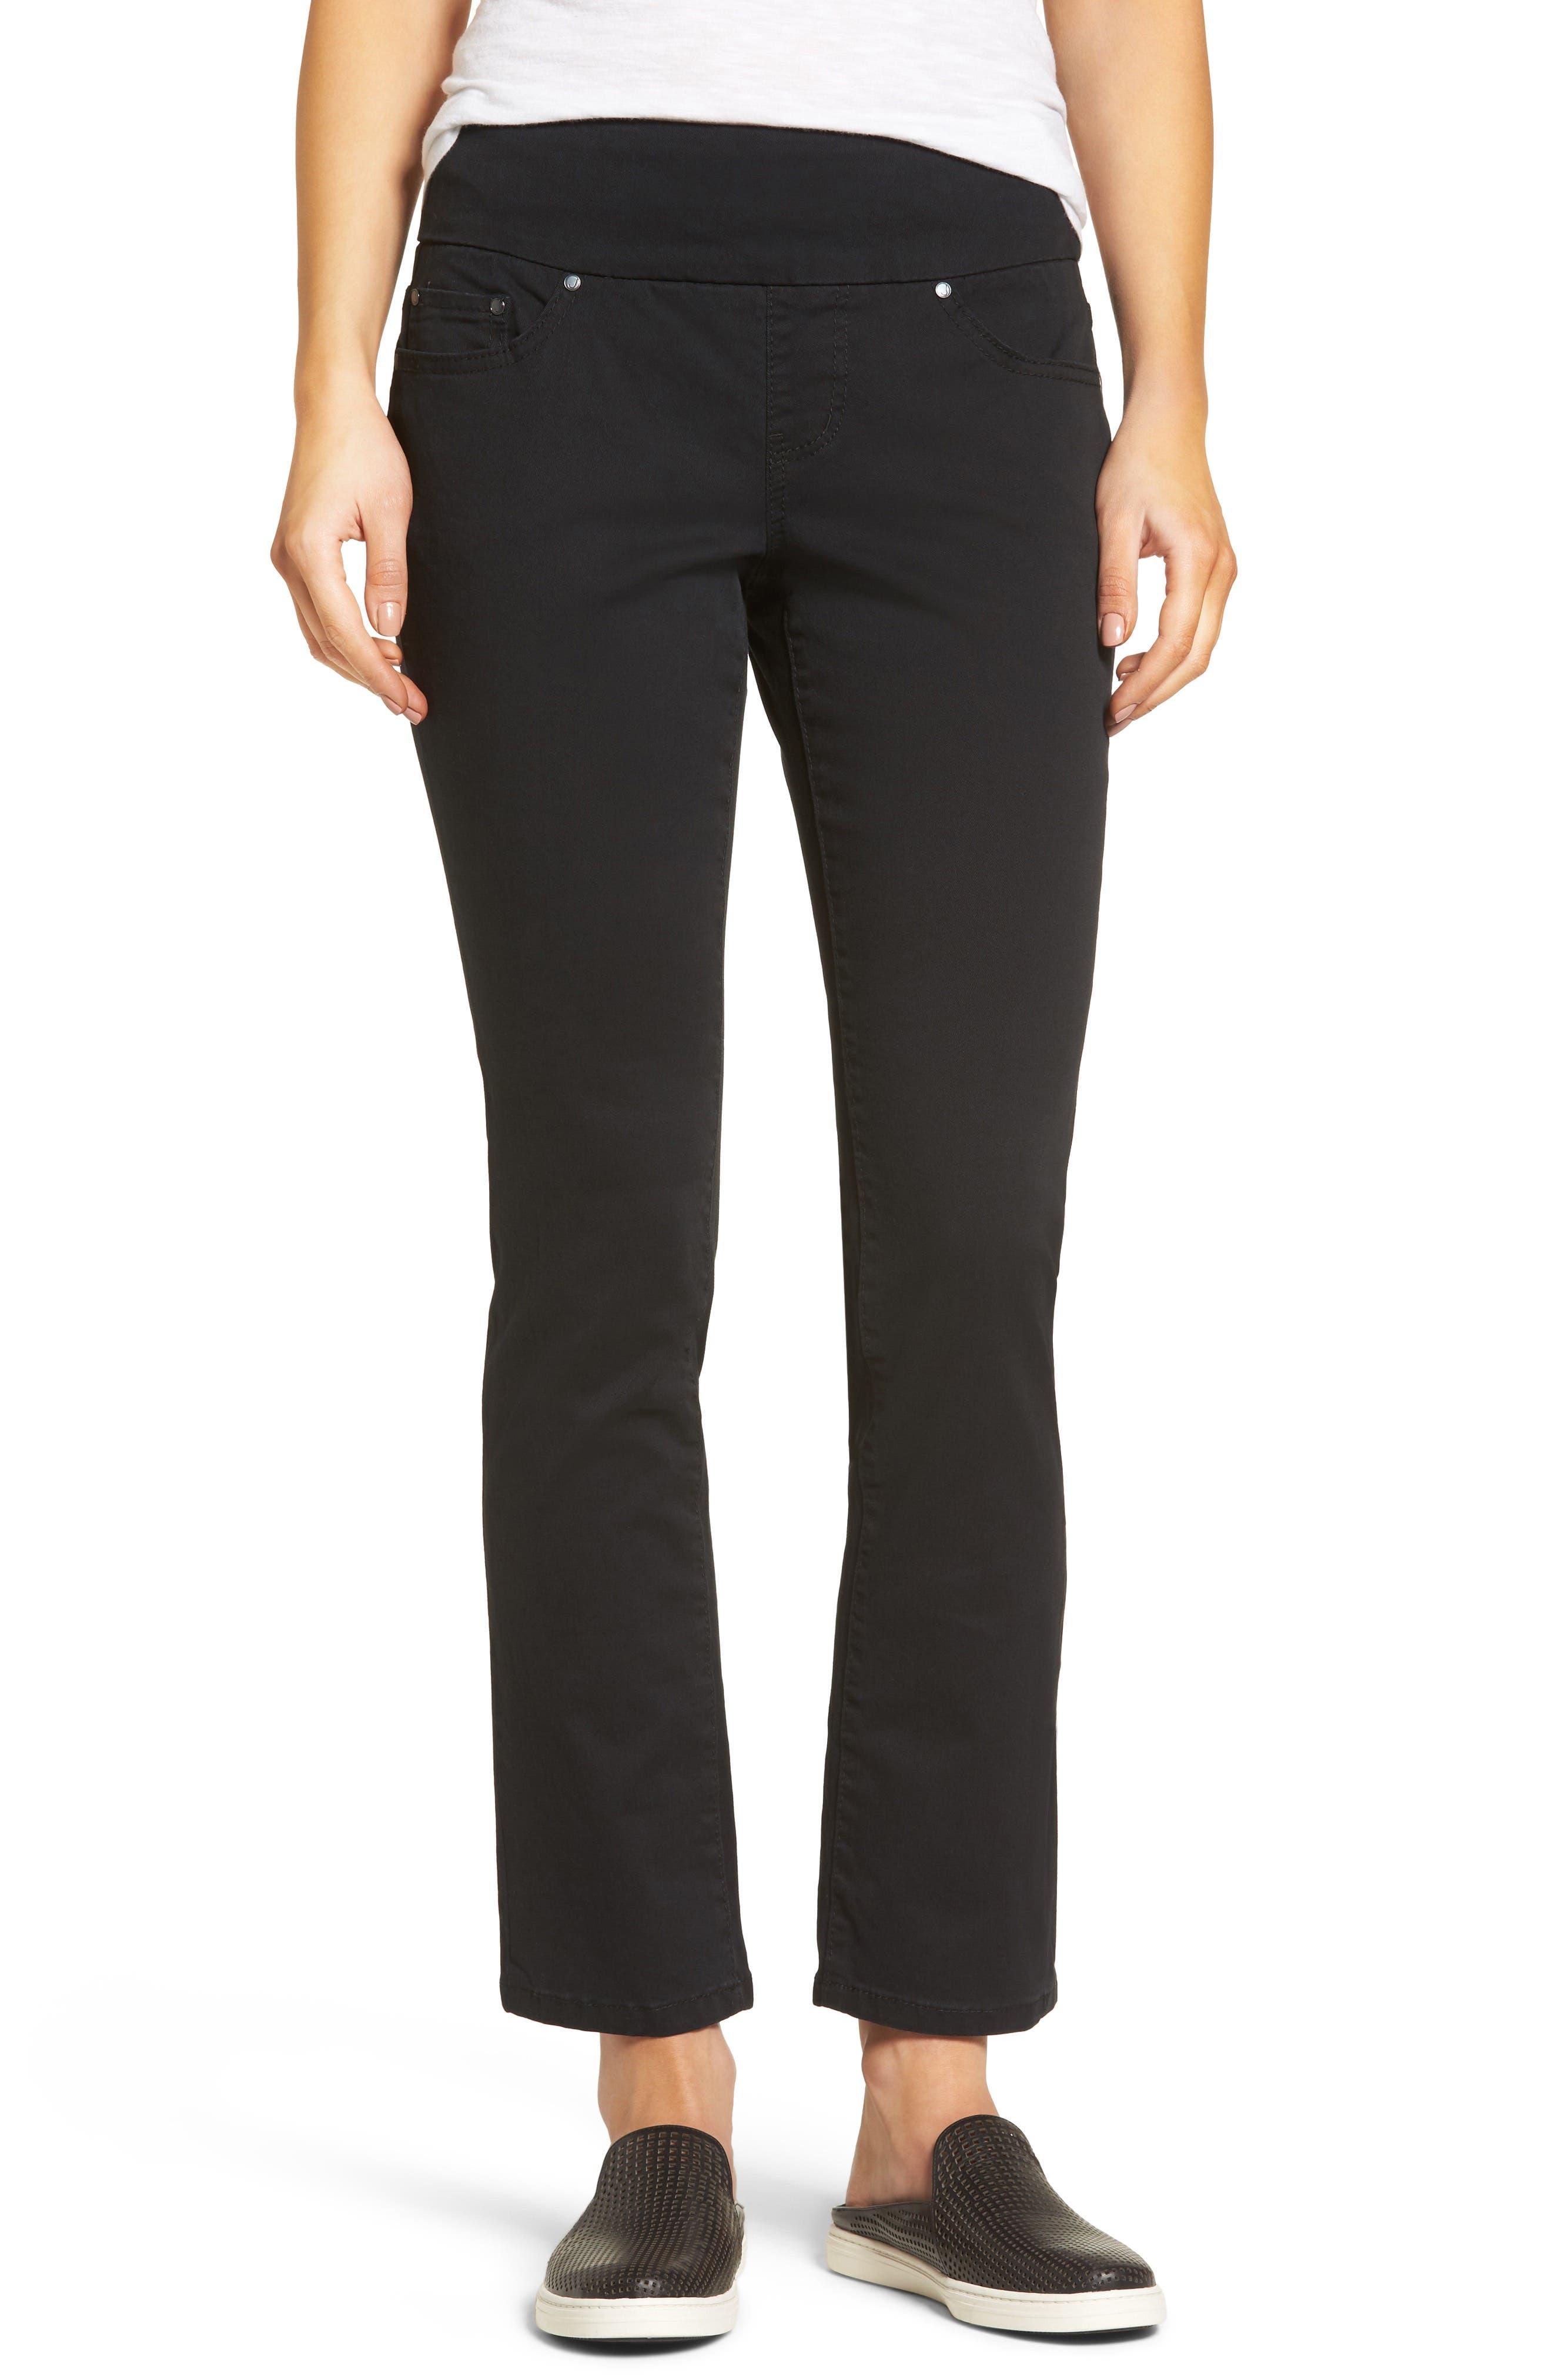 Main Image - Jag Jeans Peri Pull-On Twill Ankle Pants (Petite)